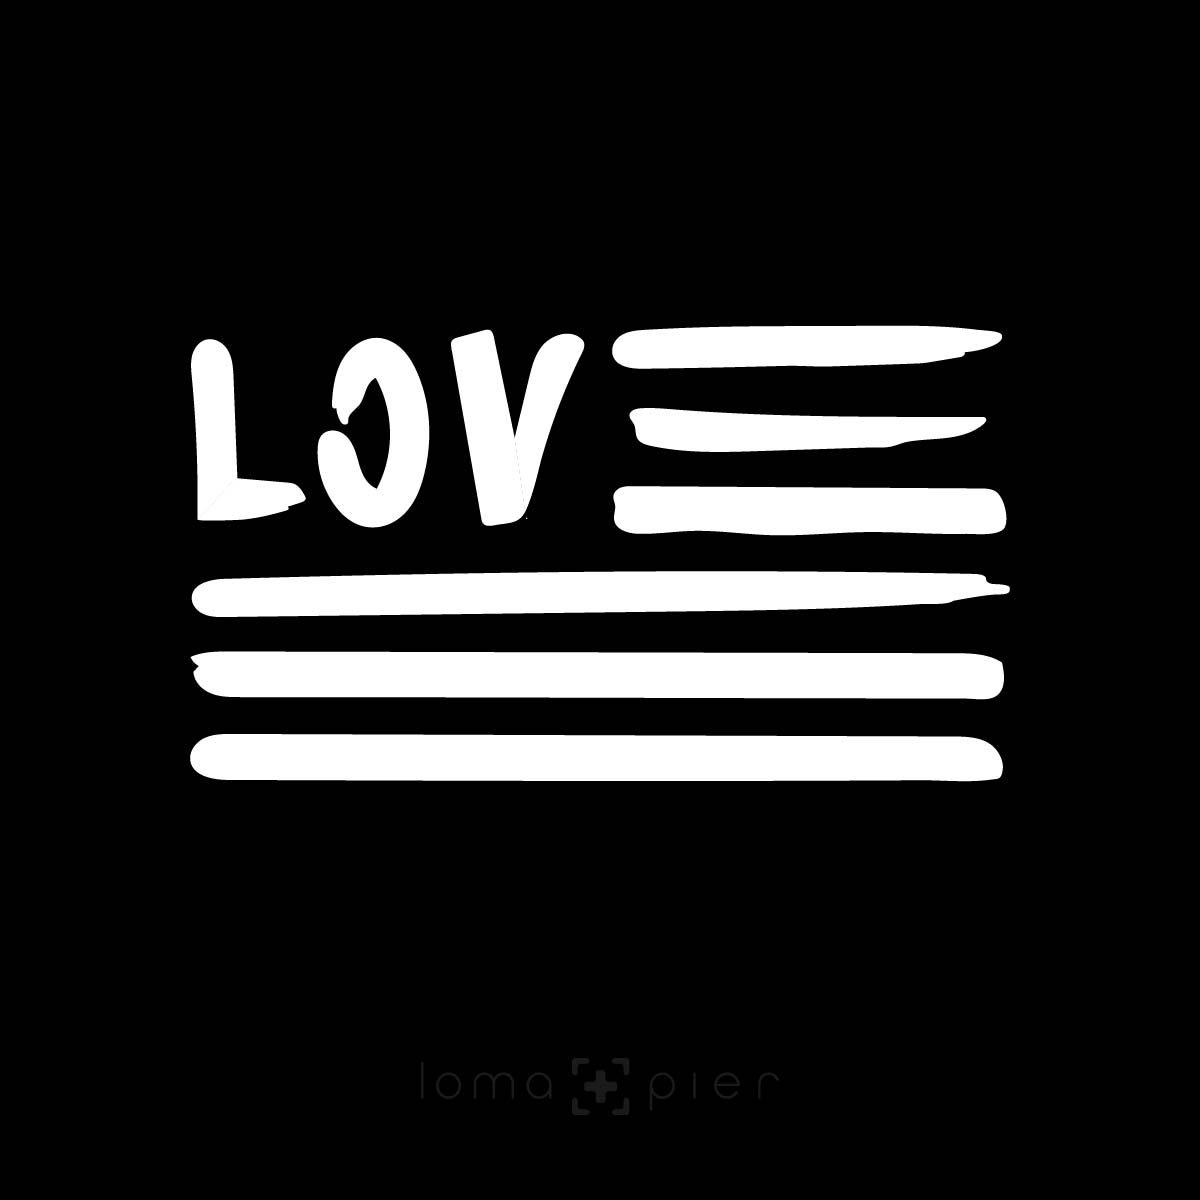 AMERICAN LOVE design by loma+pier